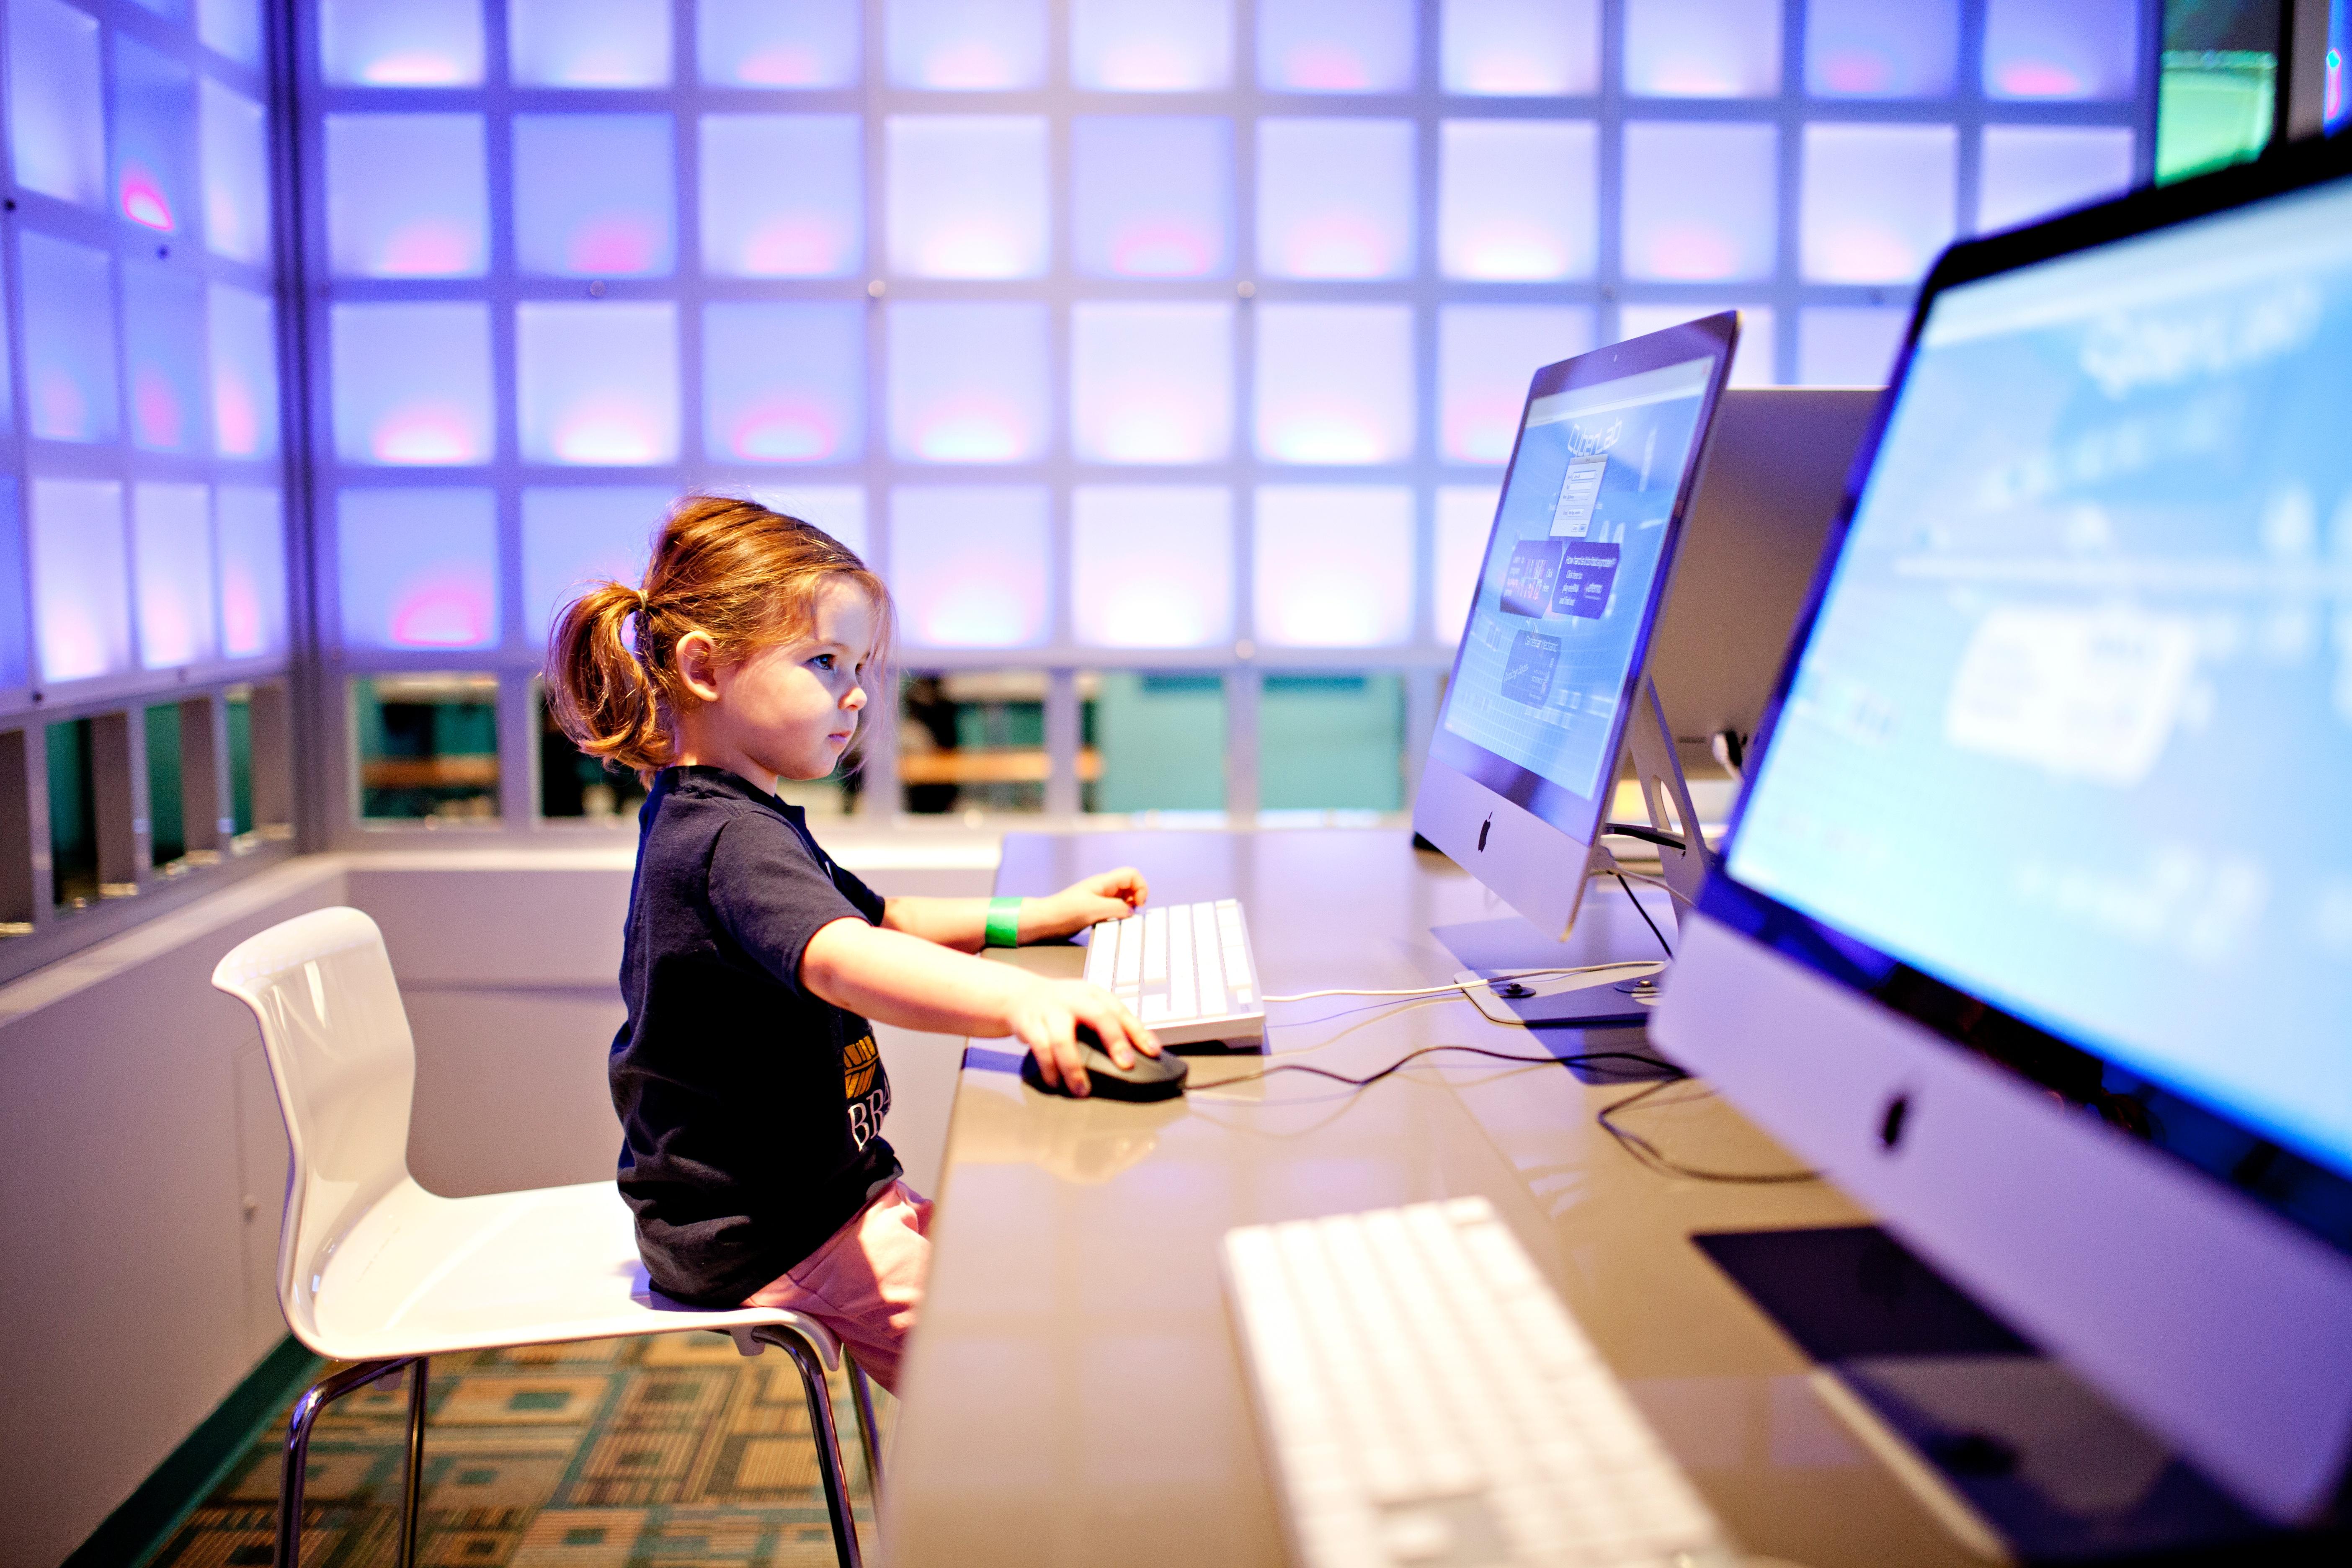 kids_online.jpg